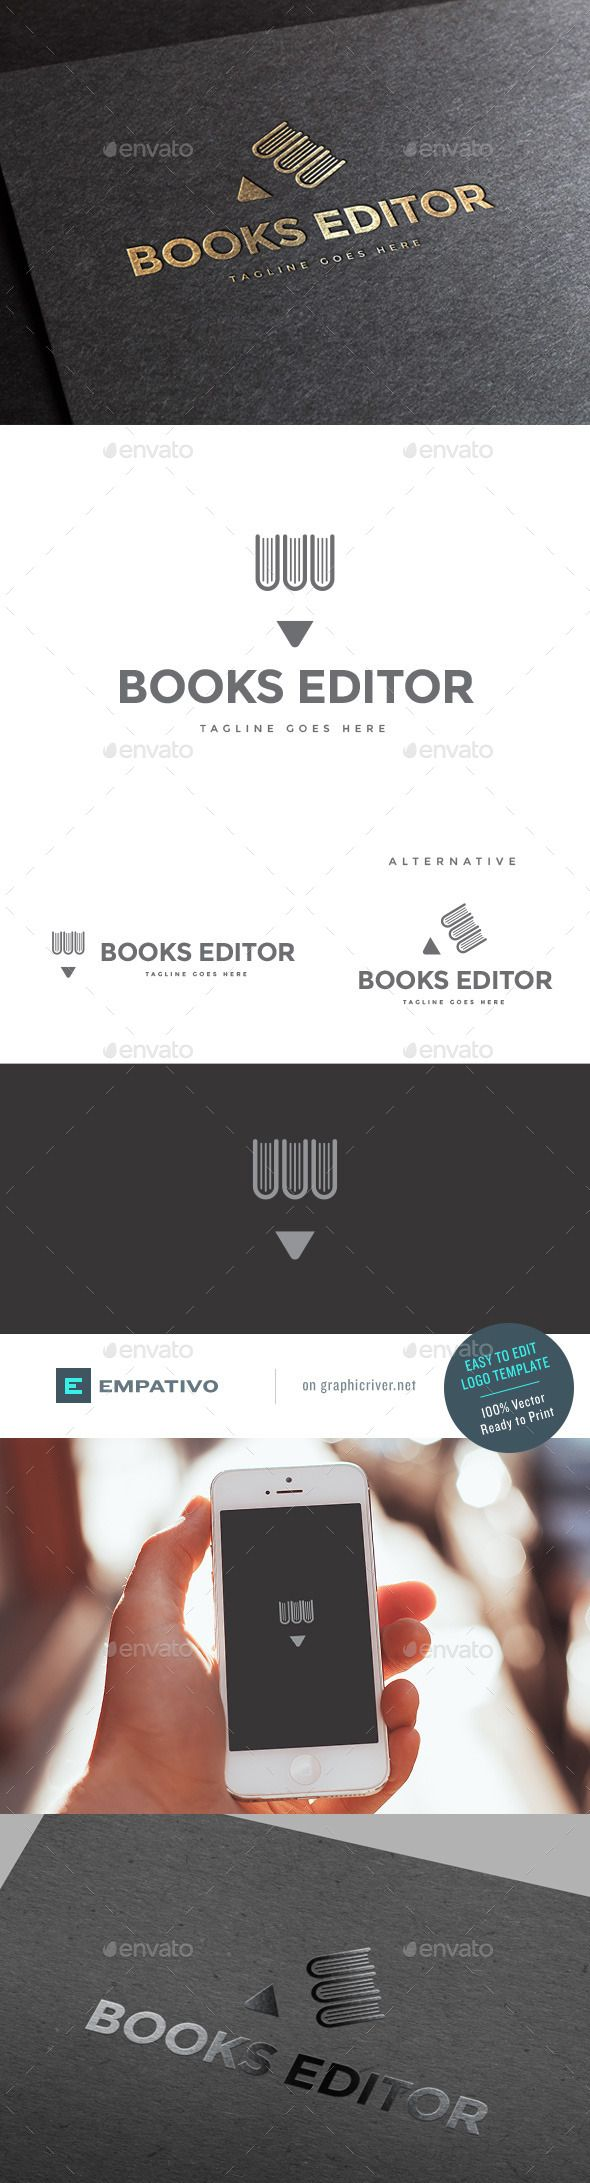 Book Publisher Logo Template - Objects Logo Templates  #RePin by AT Social Media Marketing - Pinterest Marketing Specialists ATSocialMedia.co.uk